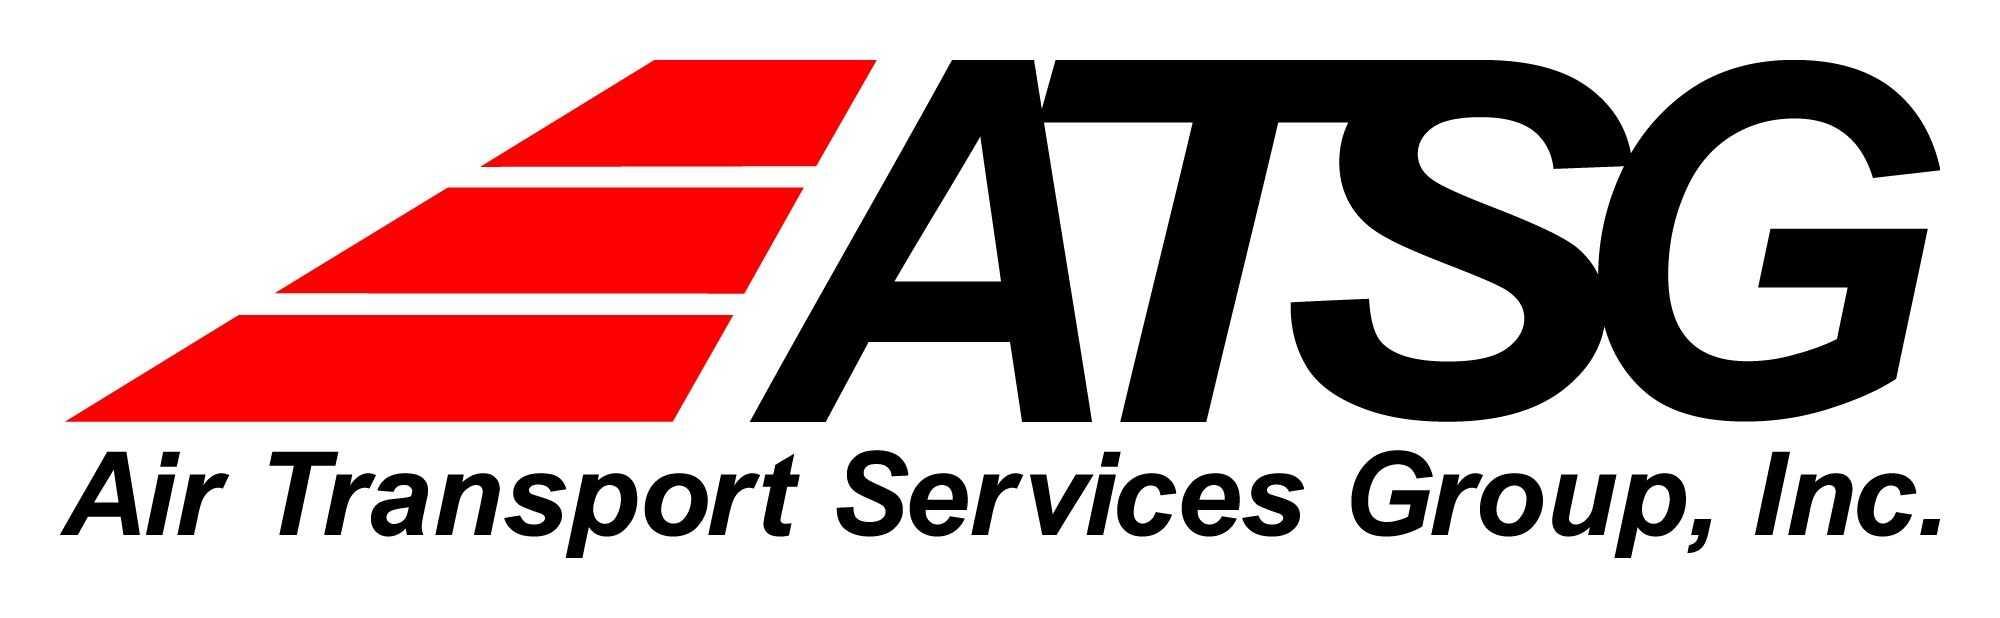 Air Transport Services Group Inc. (NASDAQ:ATSG)